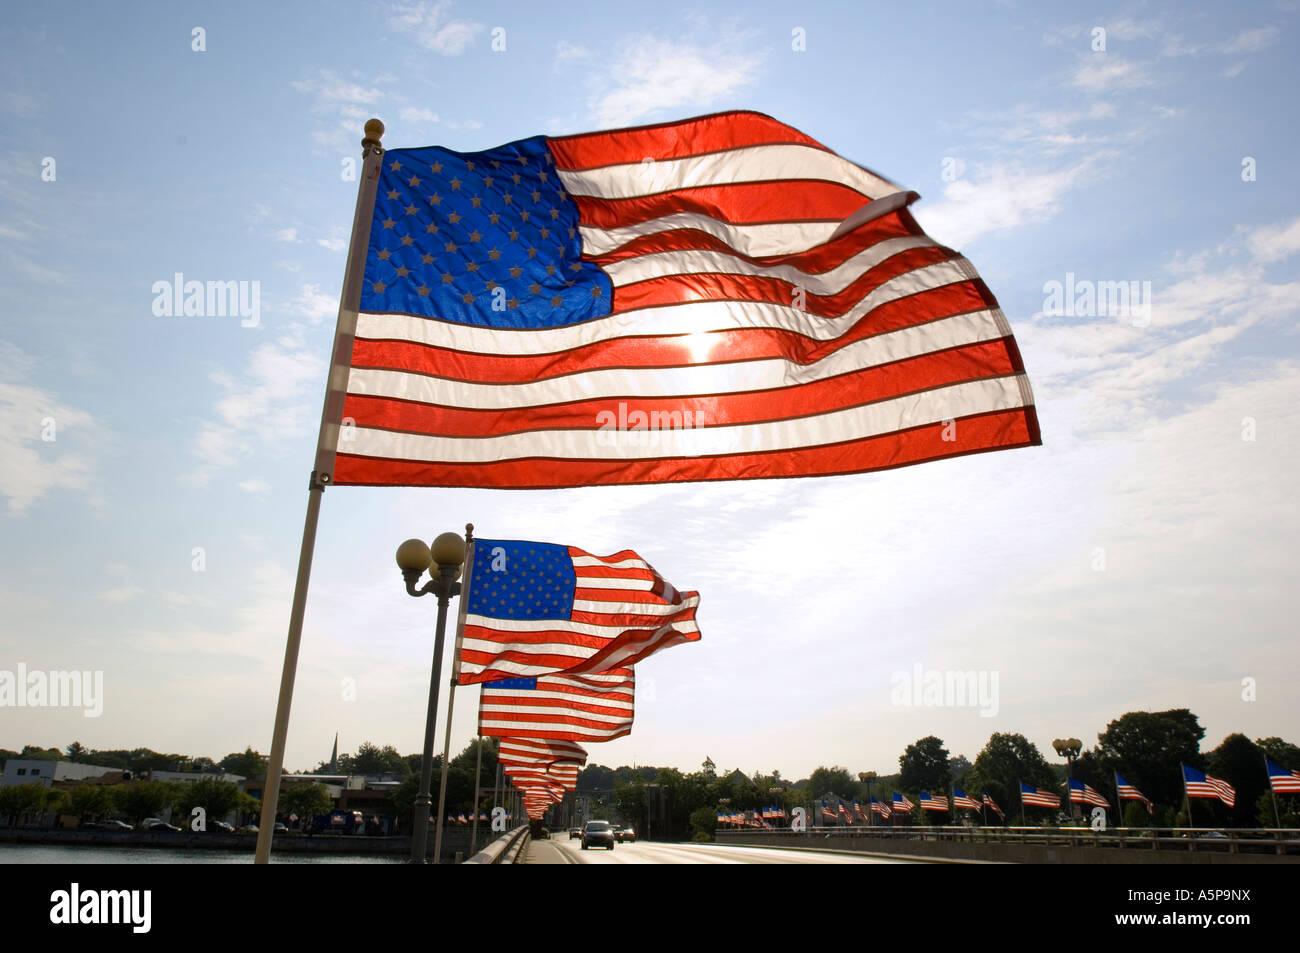 American flags on bridge, Westport, Ct. USA. - Stock Image